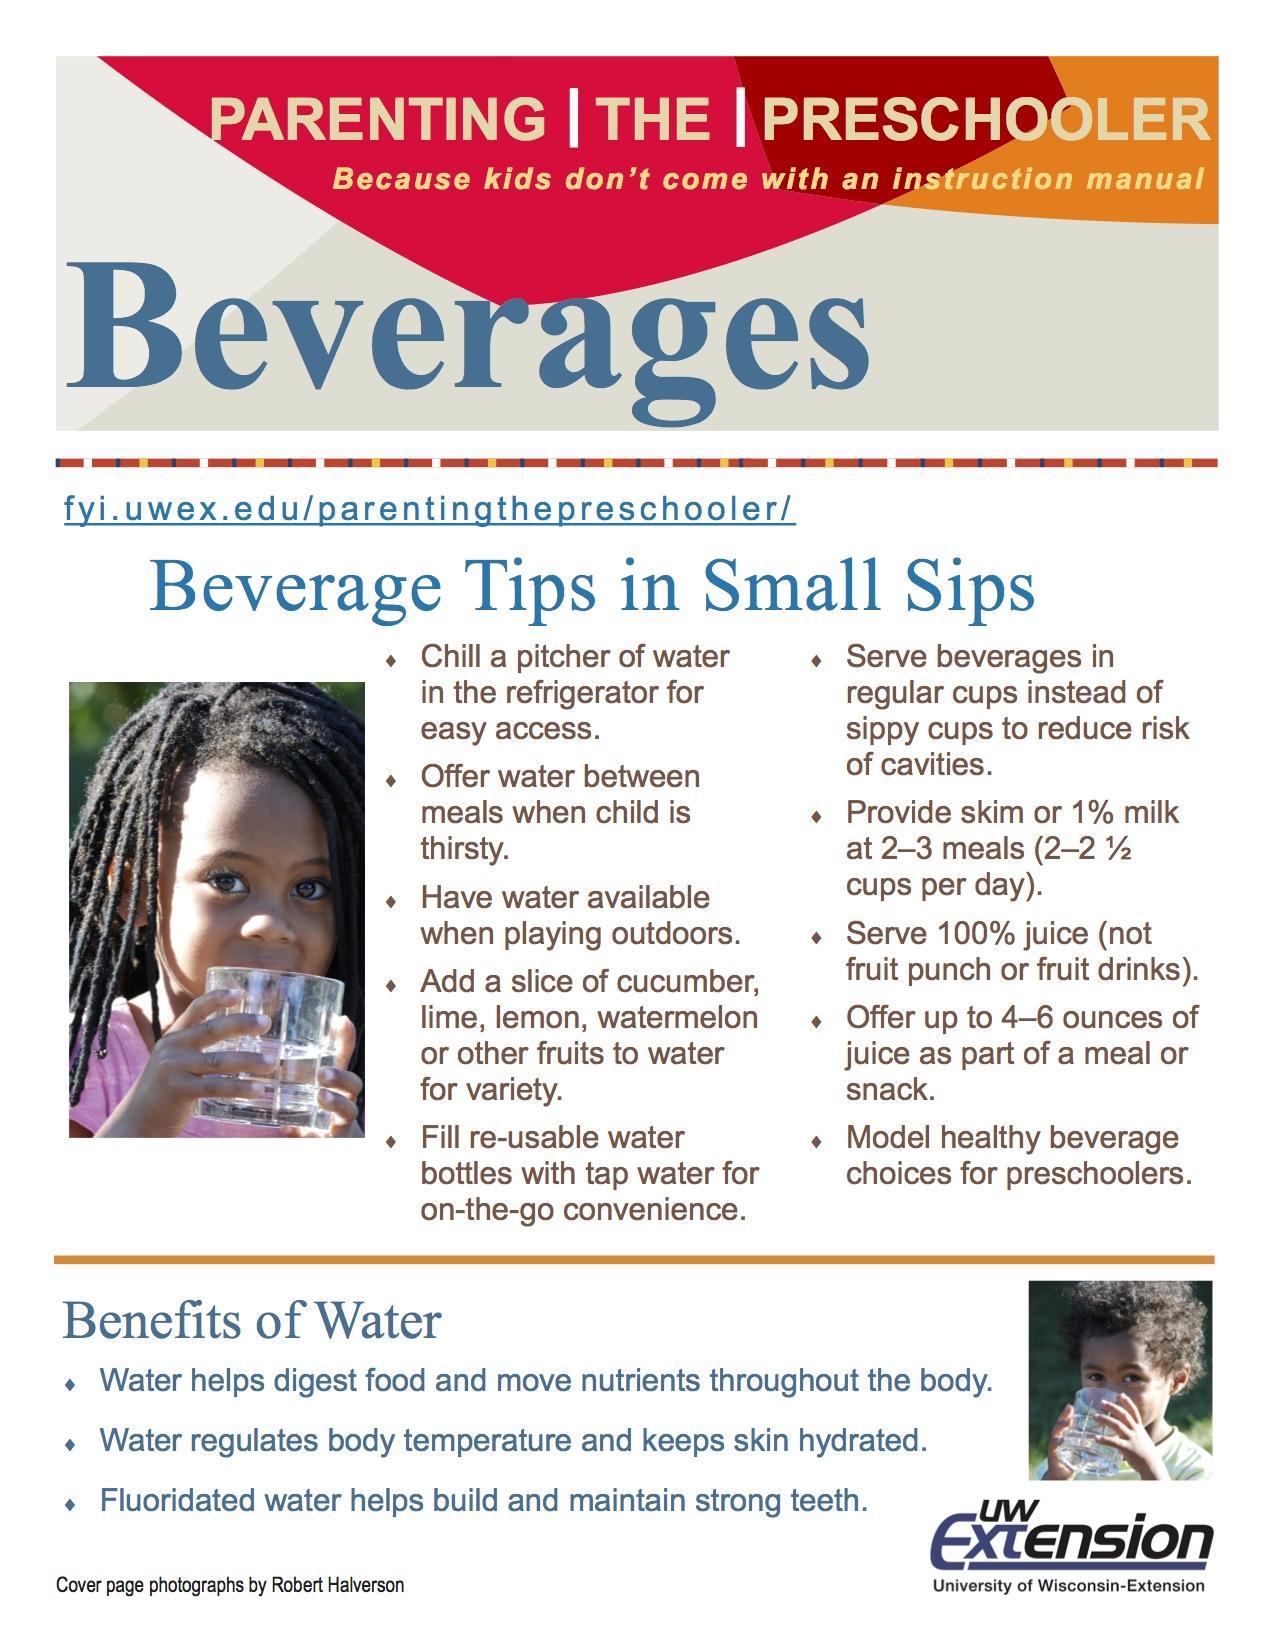 PtP-Beverage-State